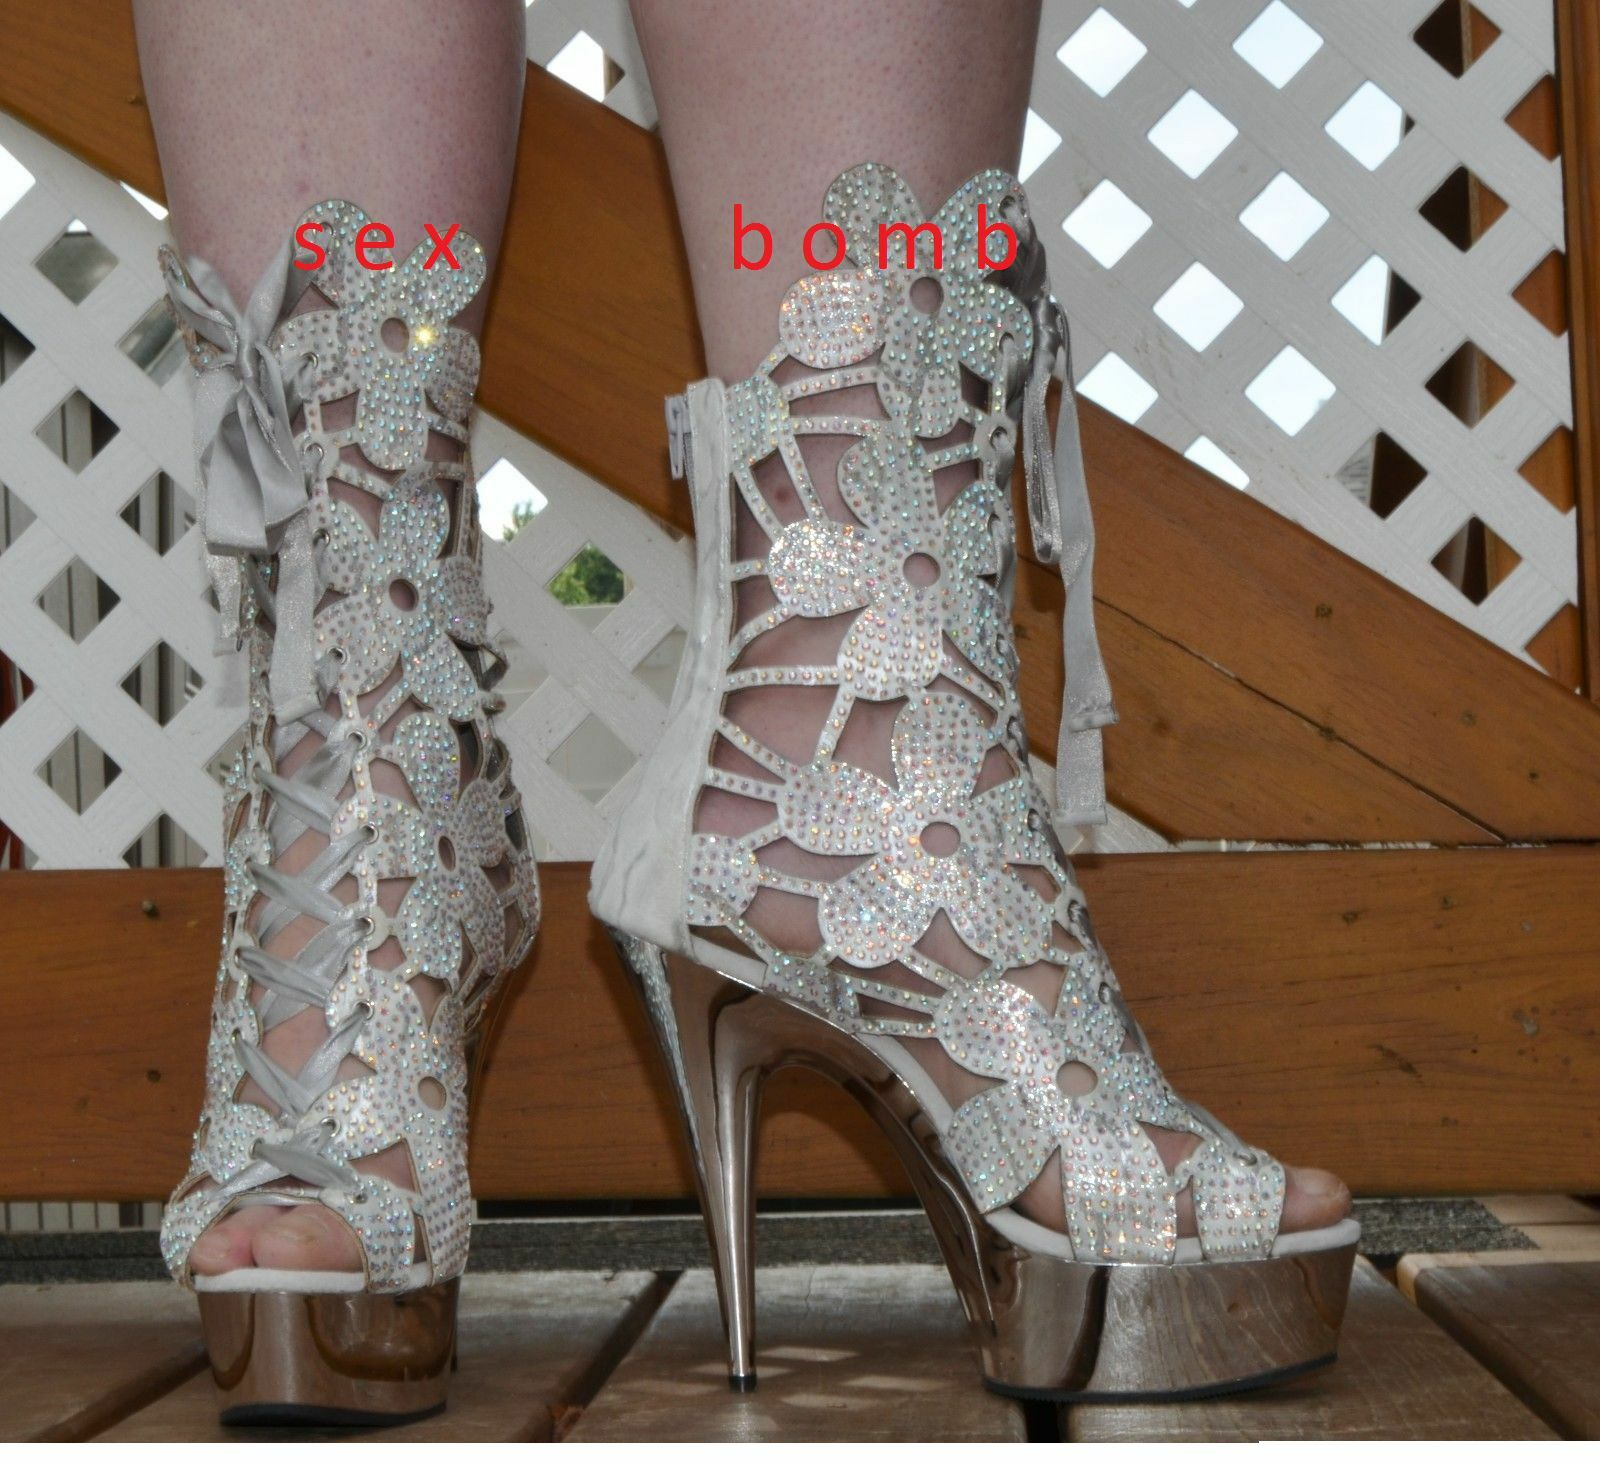 SEXY sandali stivaletti VEGAN silver silver silver plateau TACCO 15 STRASS DAL 36 A 44 GLAM 0eec49